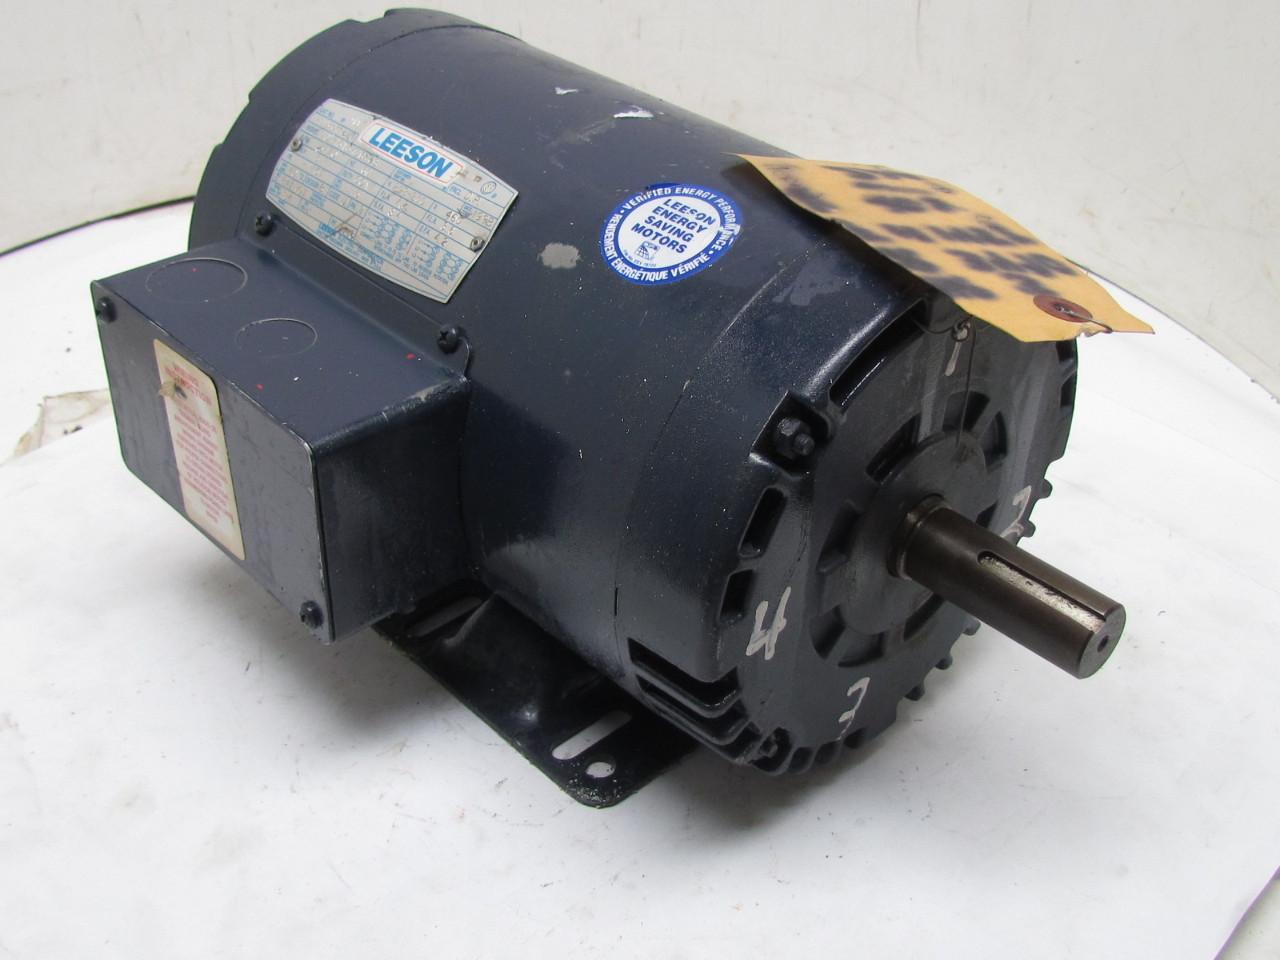 Doerr Electric Motor Parts Diagram